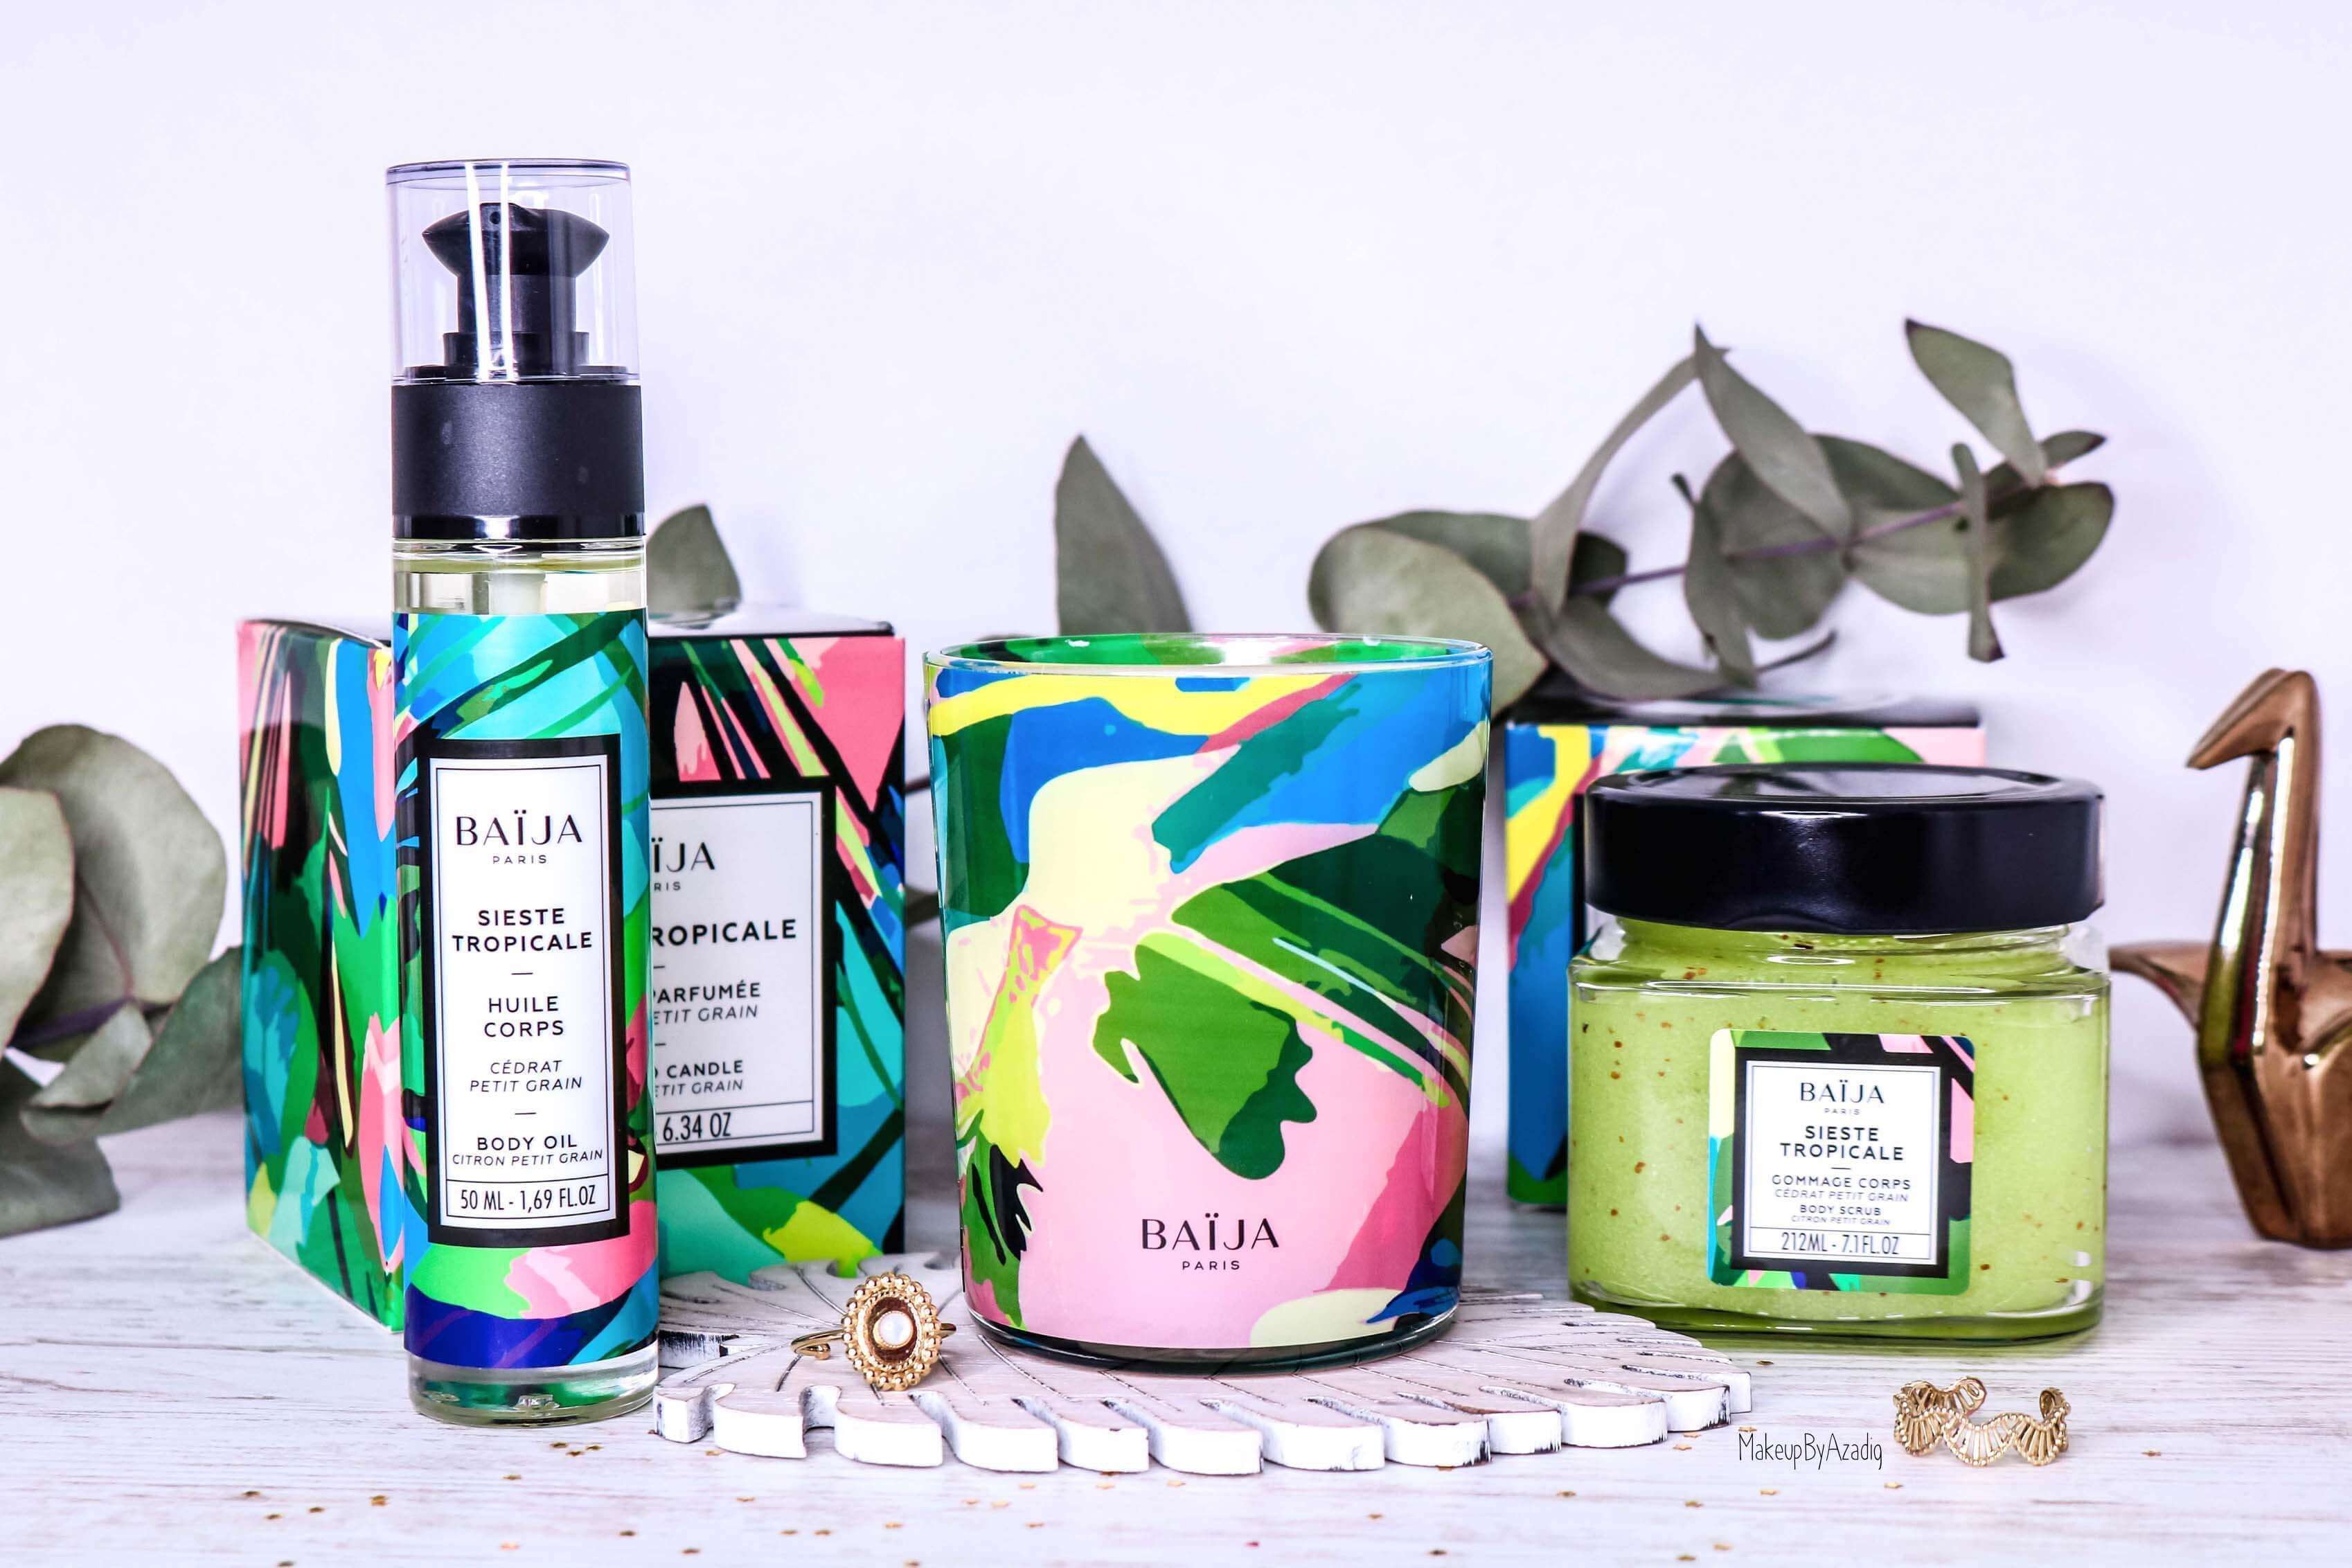 revue-collection-sieste-tropicale-baija--cedrat-paris-corps-bougie-gommage-soin-citron-makeupbyazadig-avis-prix-sephora-collection